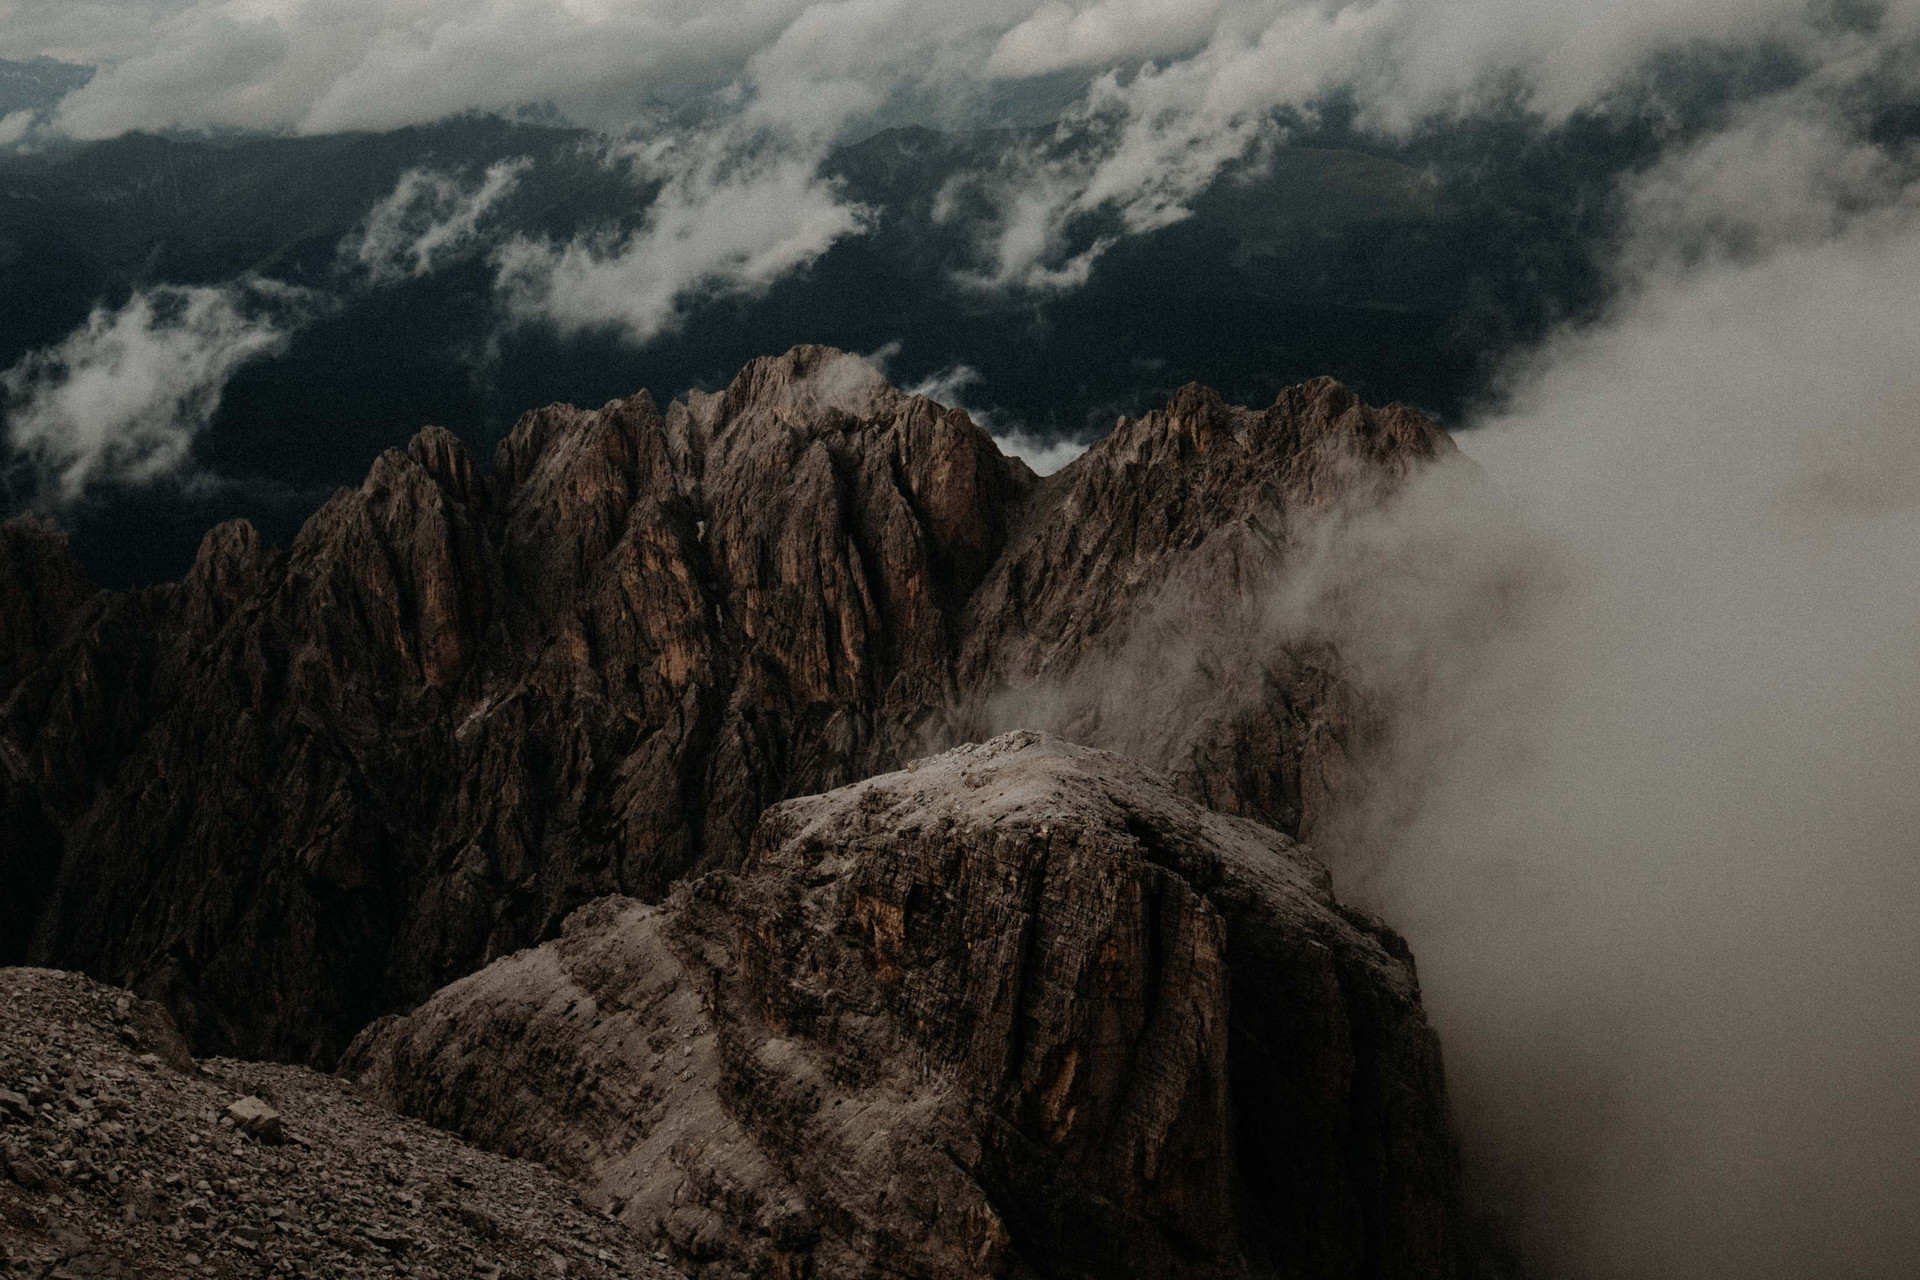 18-07-16-20 Dolomiti-57.jpg